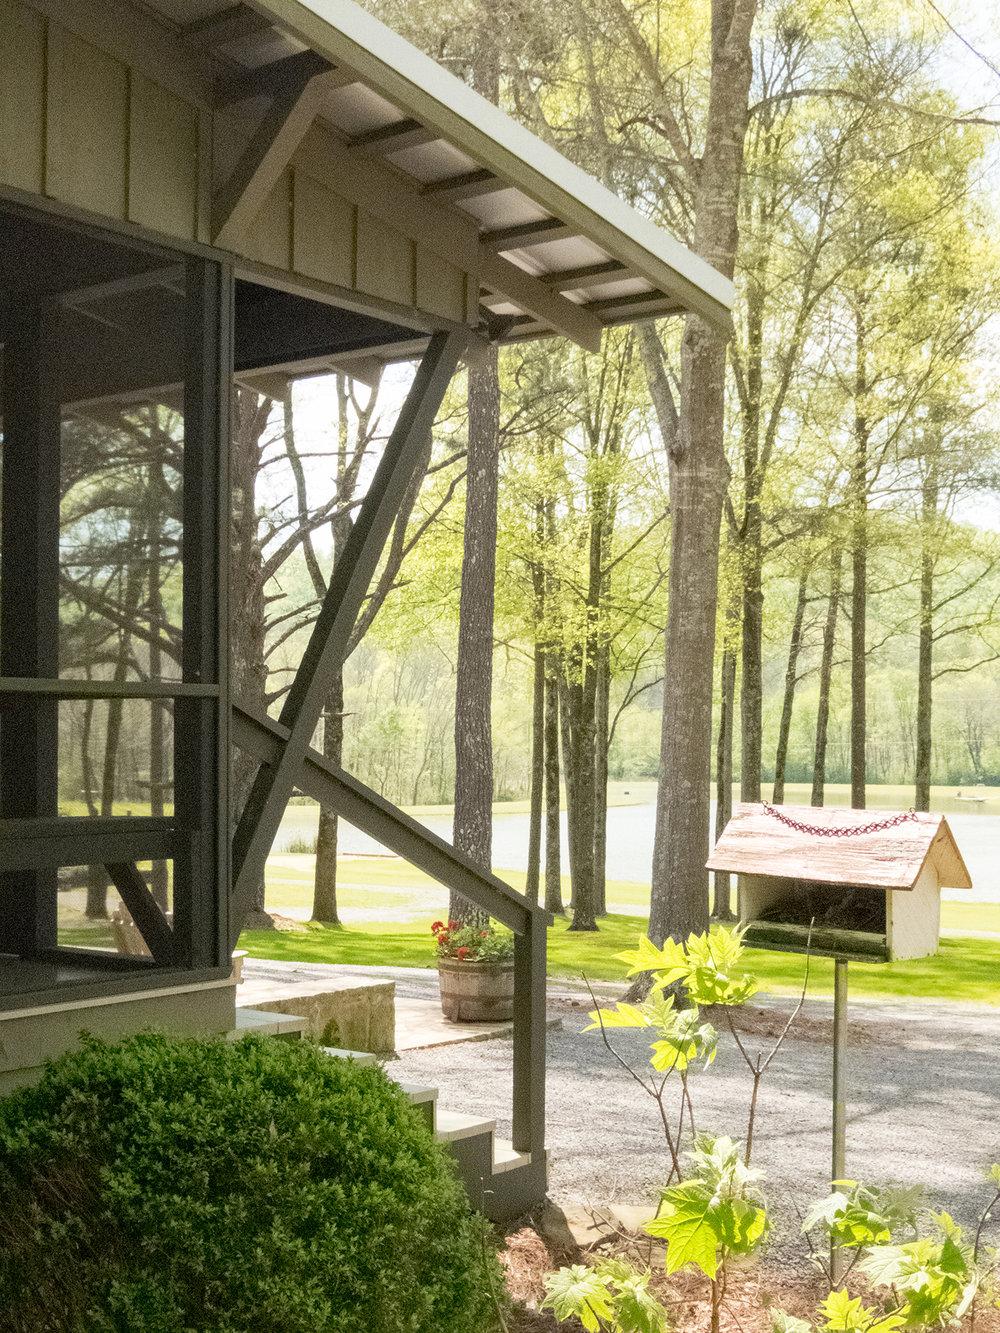 sugar_creek_farm_04_lakehouse_lake_house_screened_porch_farmhouse_tin_roof_1500.jpg